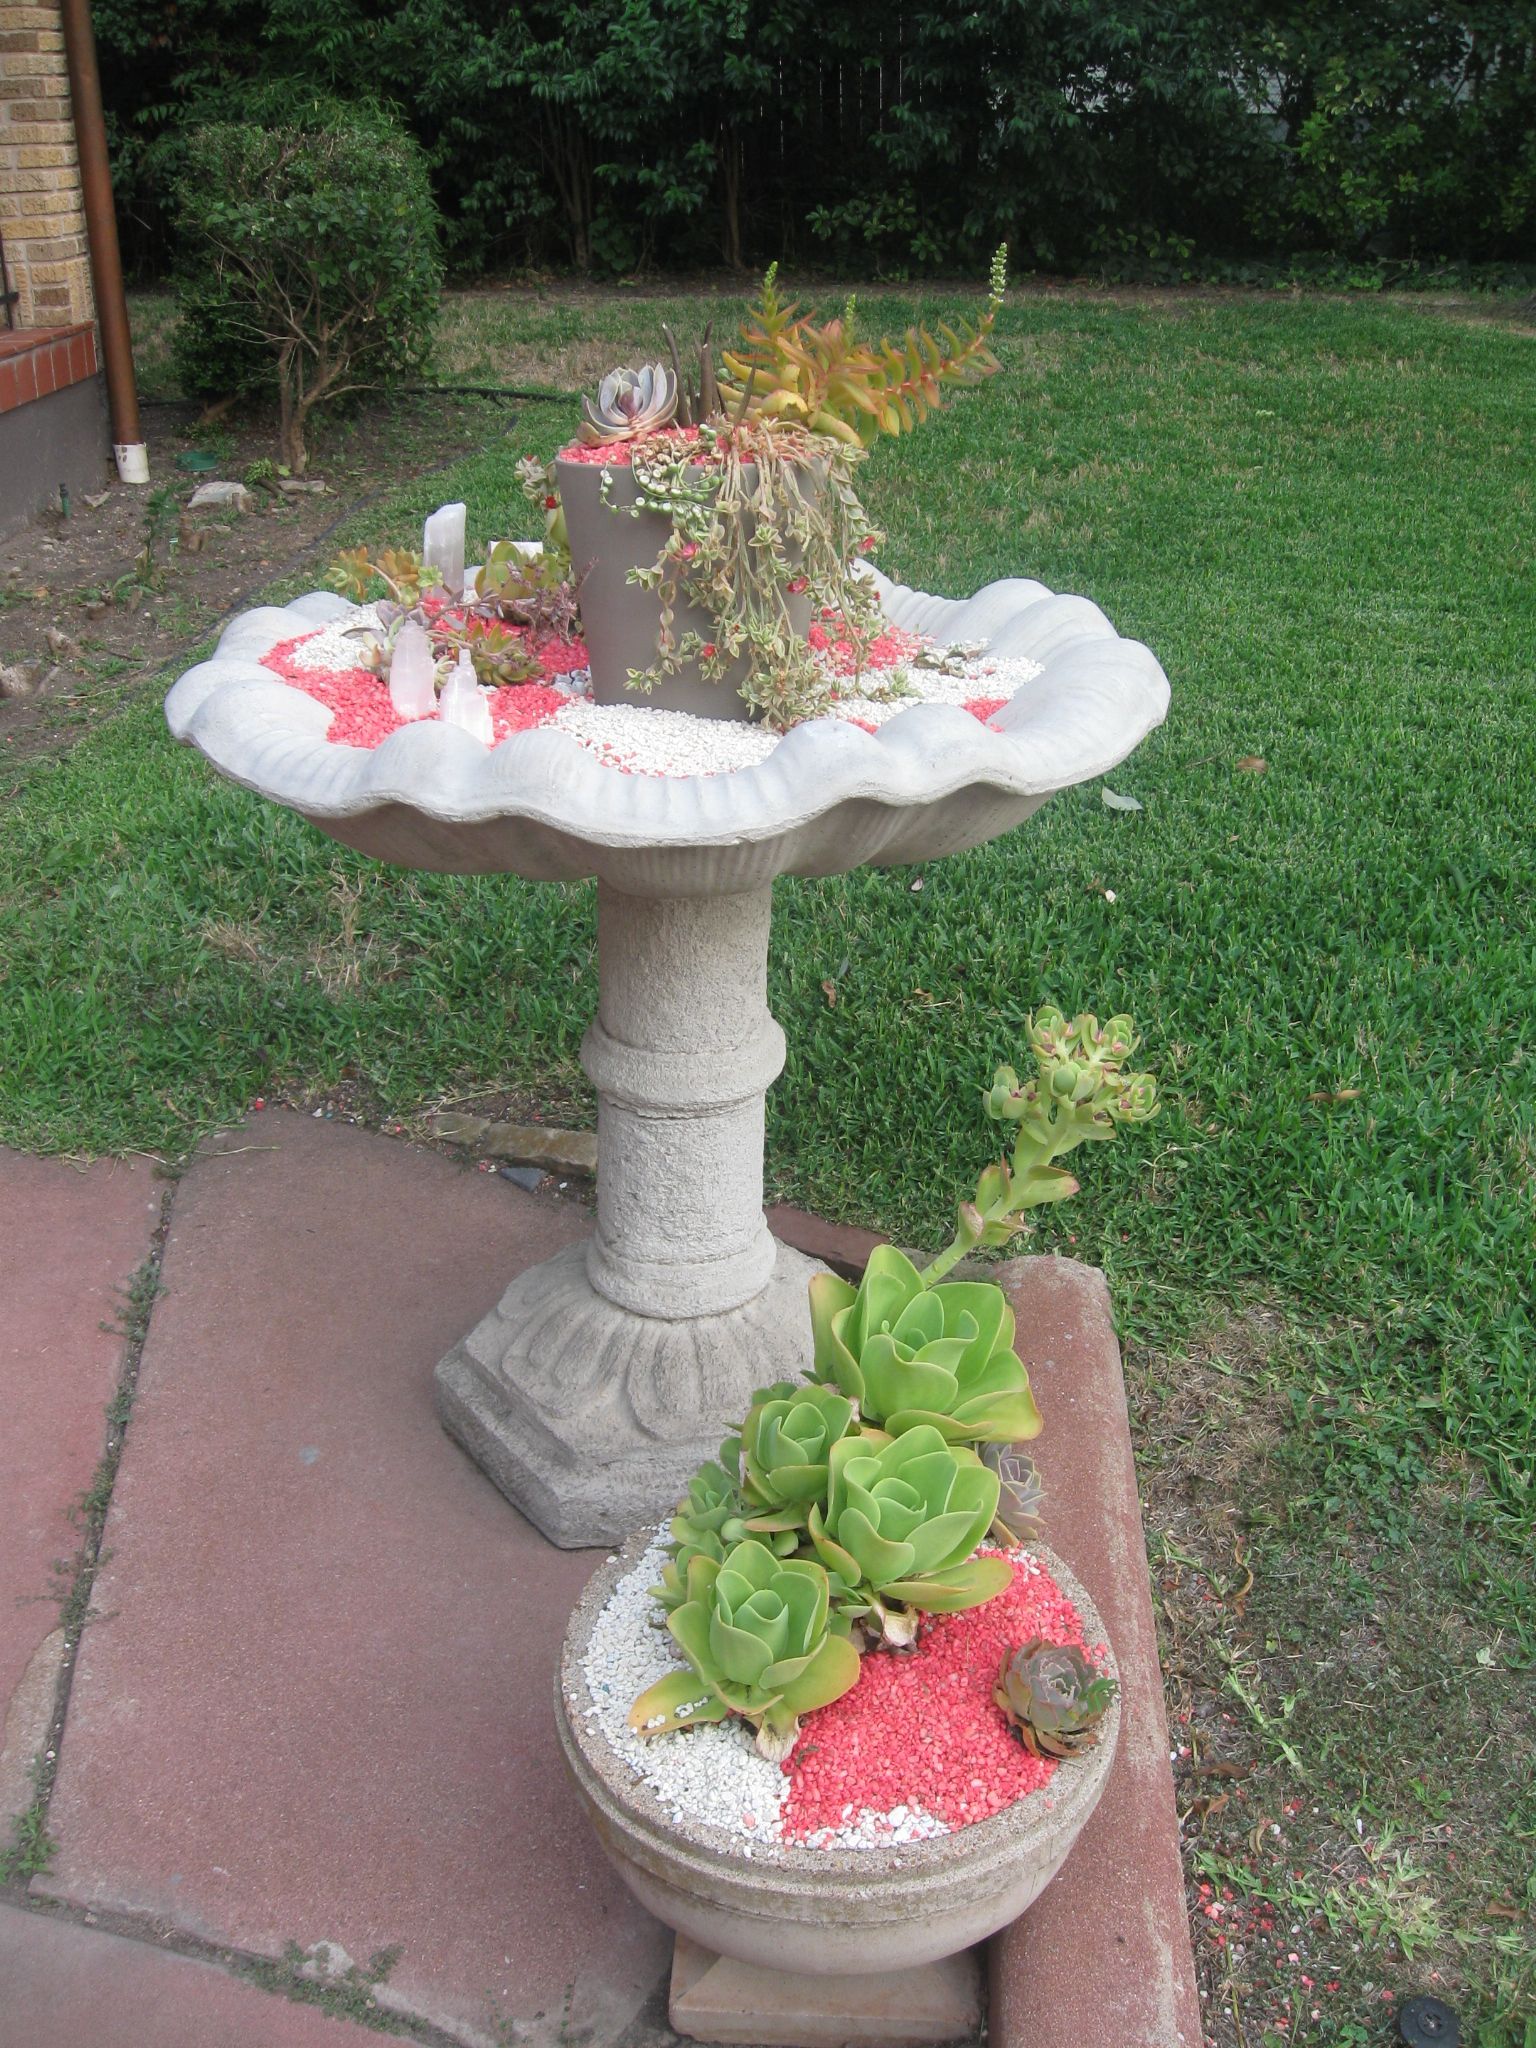 Outdoor succulent container garden #succulents #container garden #neon #modern